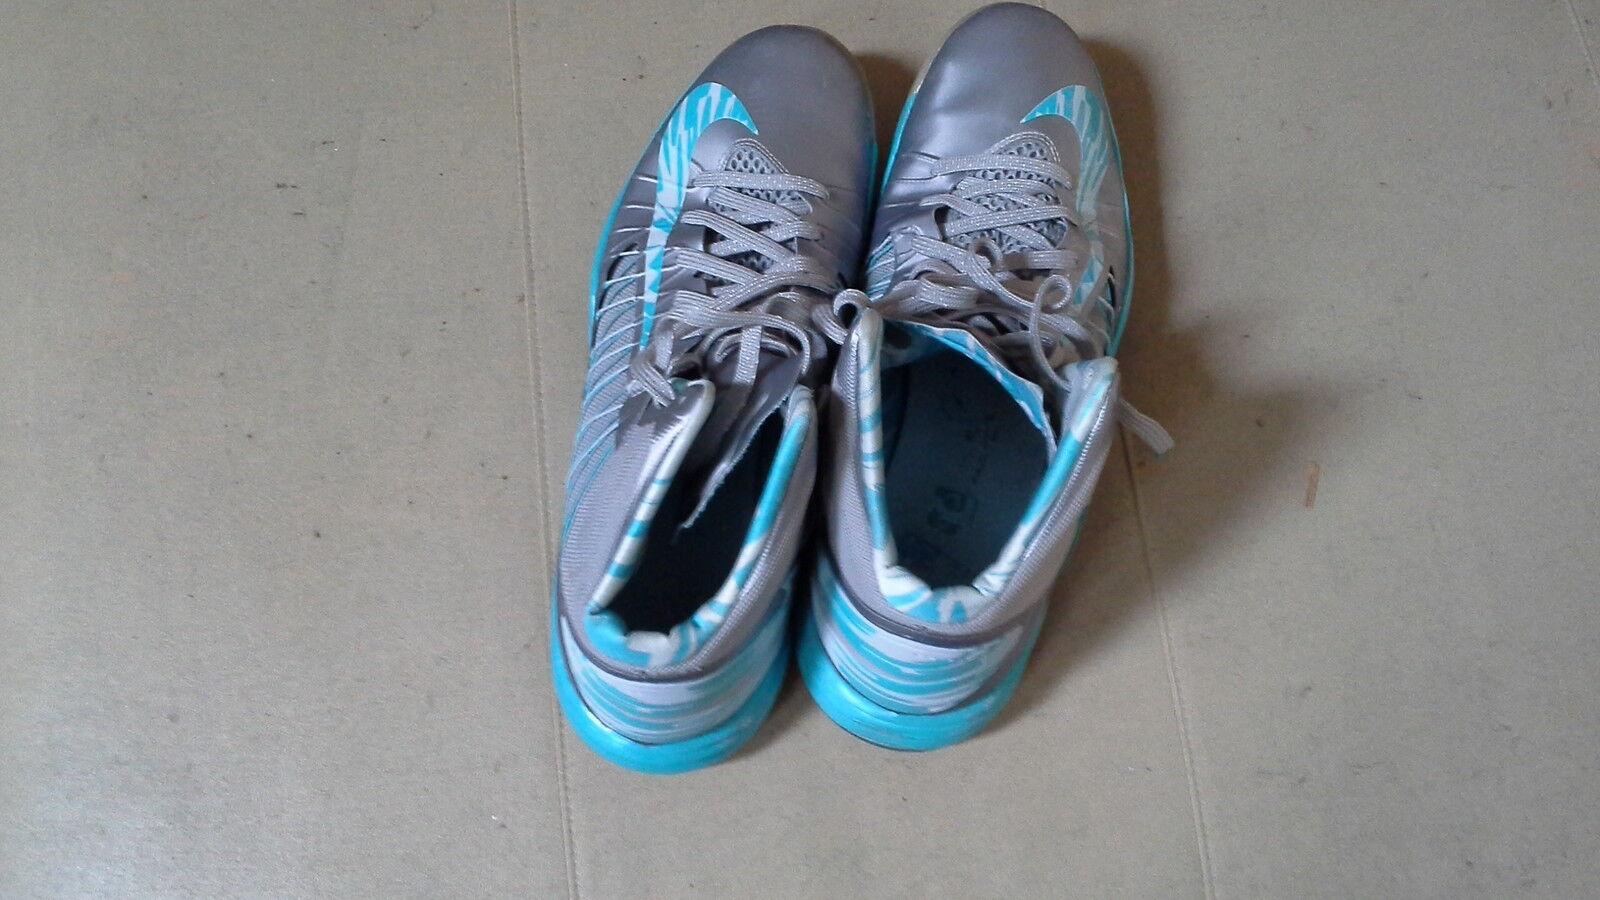 Nike lebron xi 11 11 xi ext denim qs nuovo sergente nero / nere 659509-004 numero 9 455f91